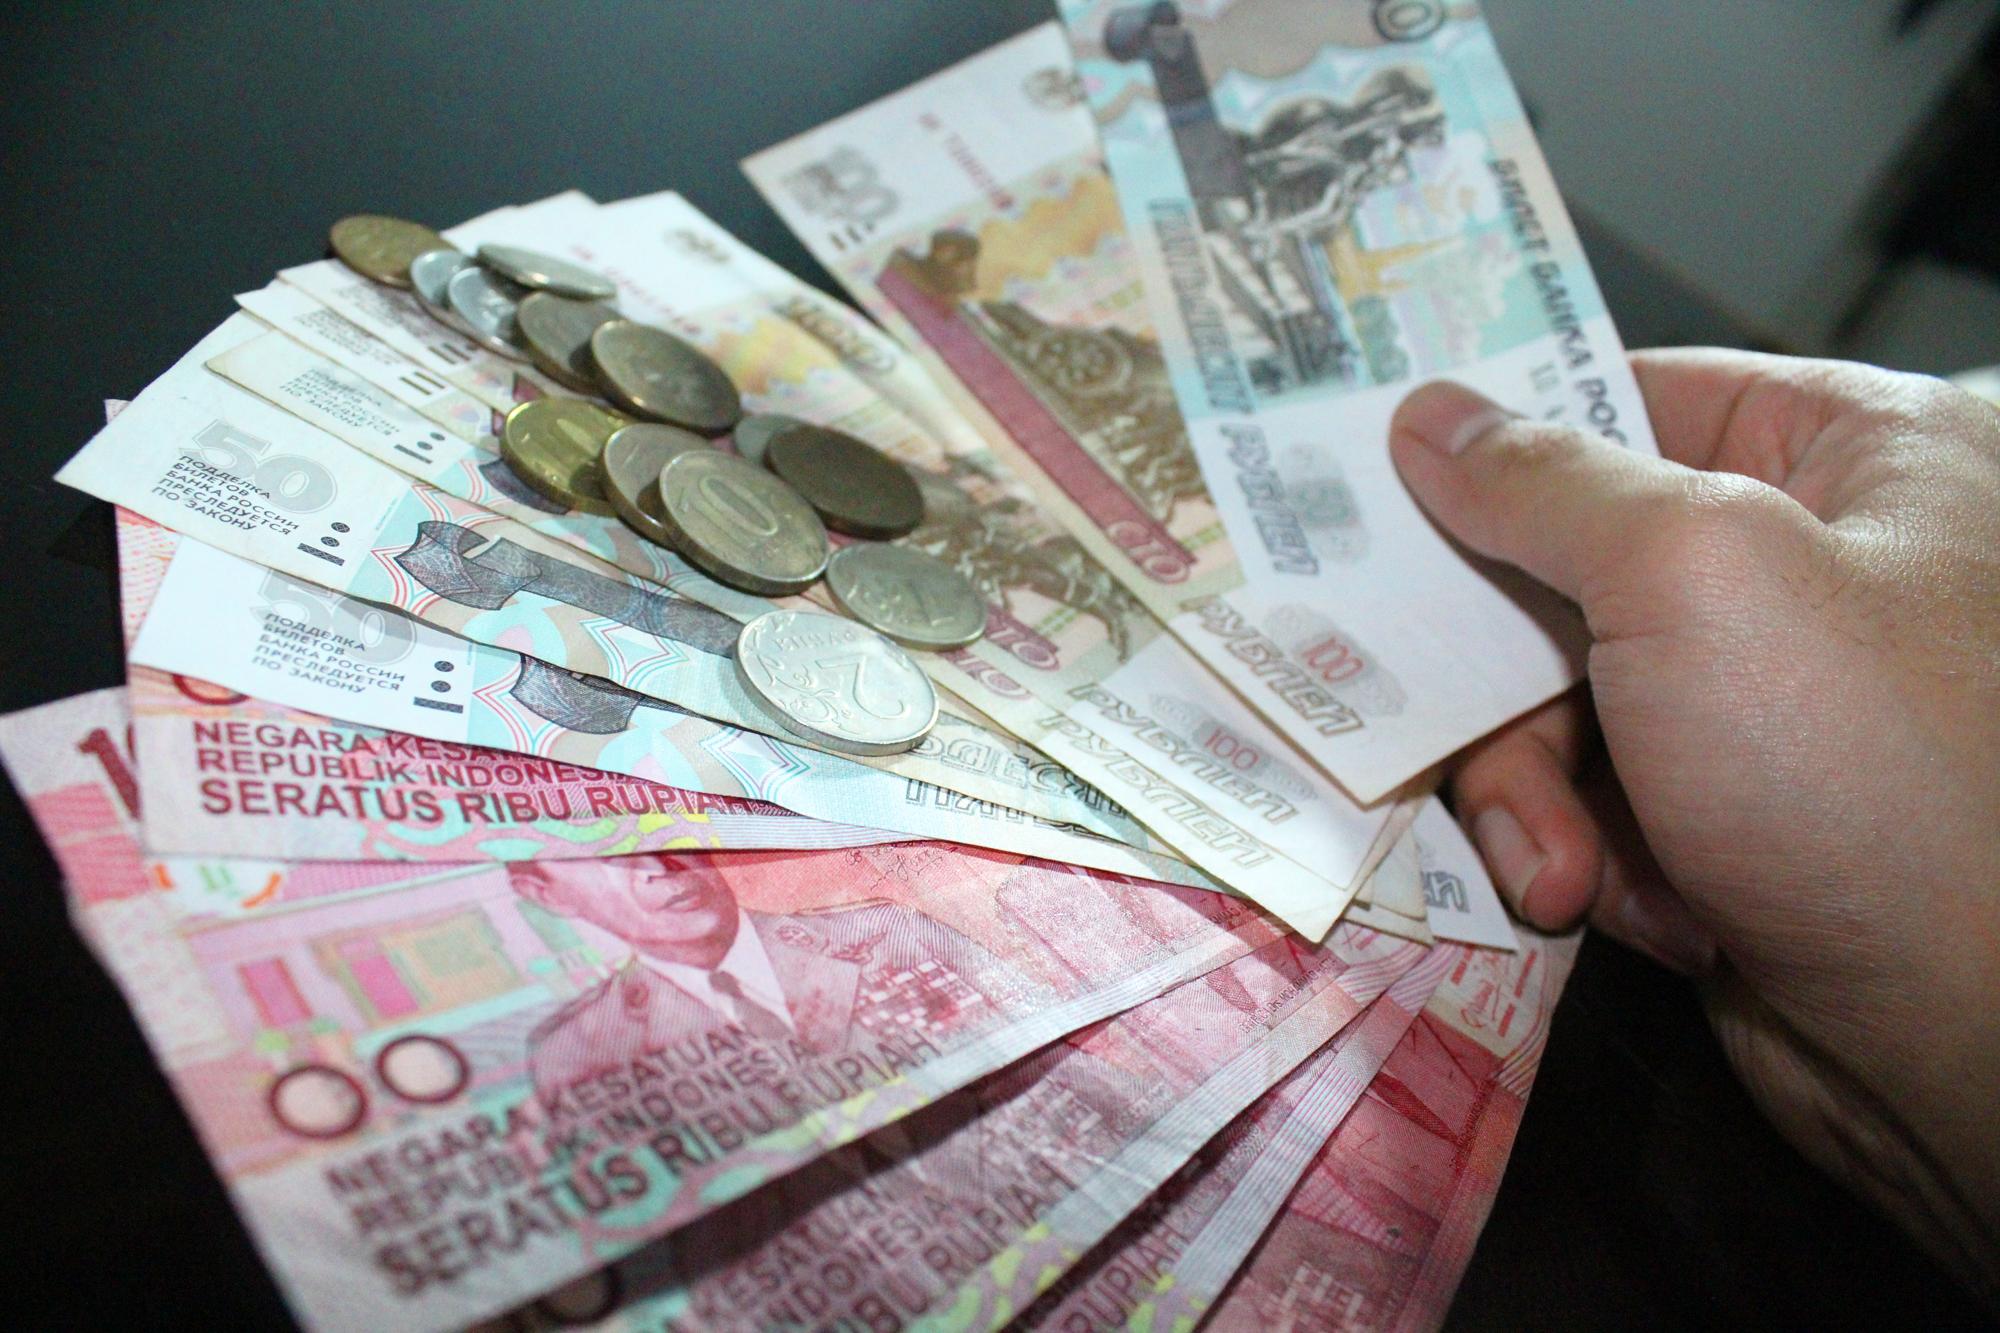 Bank Indonesia mengeluarkan Peraturan BI No. 17/3/2015 mengenai kewajiban penggunaan mata uang rupiah di wilayah NKRI dengan pertimbangan banyaknya transaksi dalam negeri masih menggunakan valuta asing.